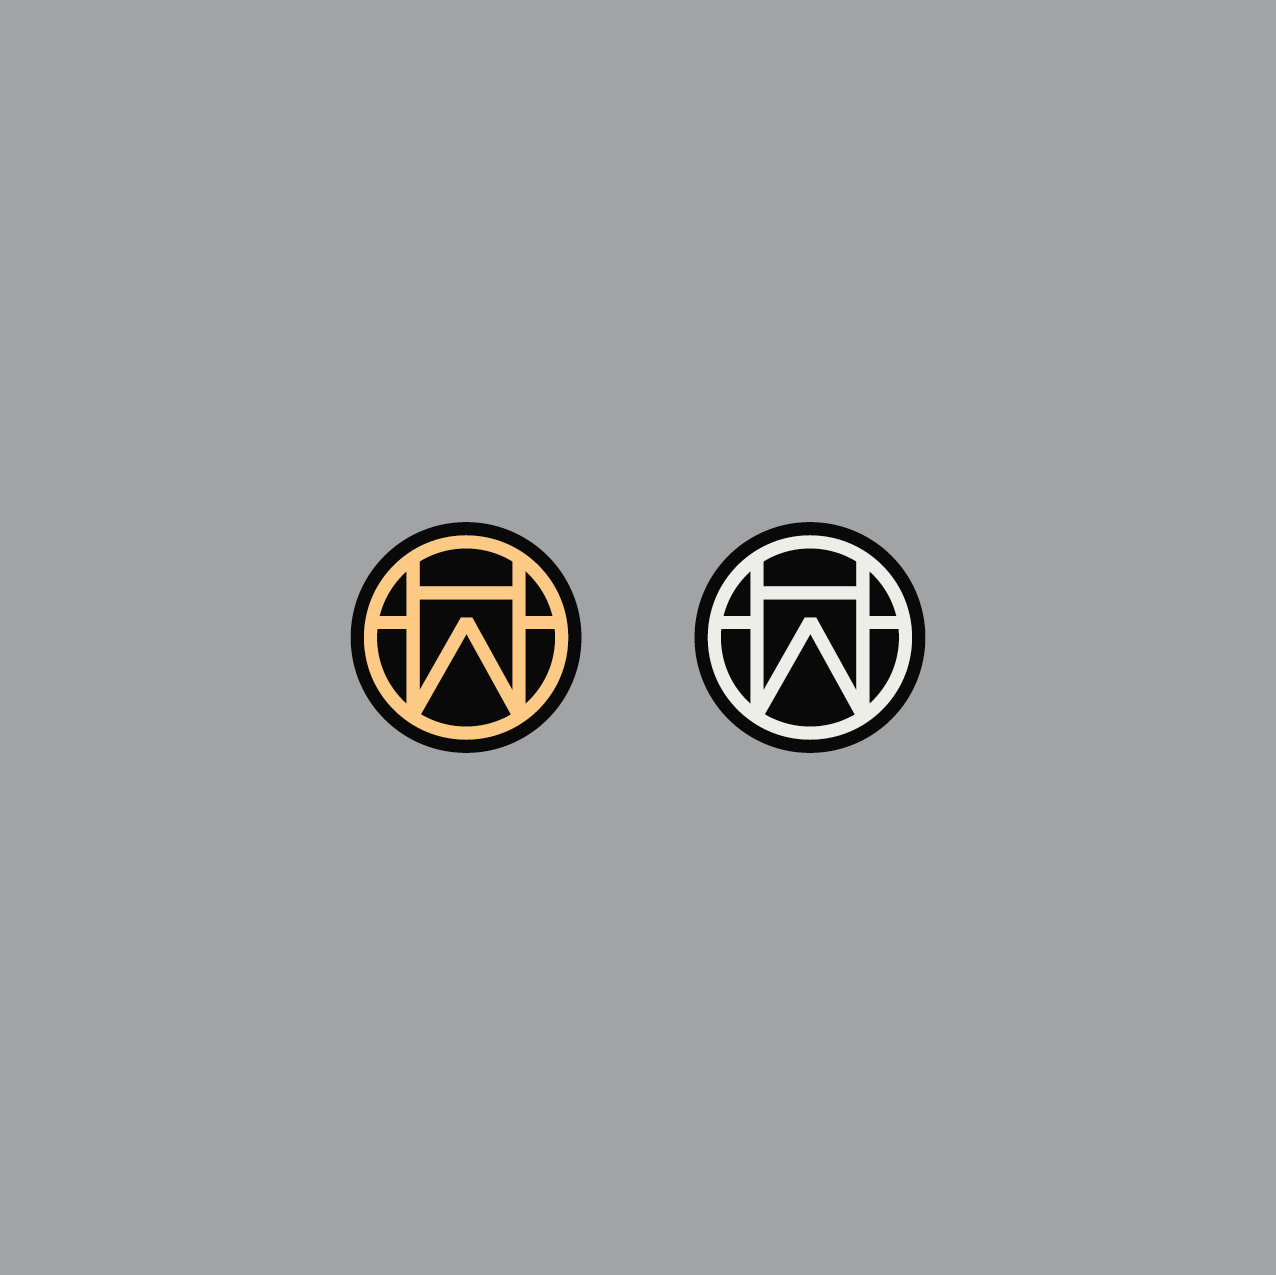 omit-studios-miami-weldwork-detroit-branding-3.jpg